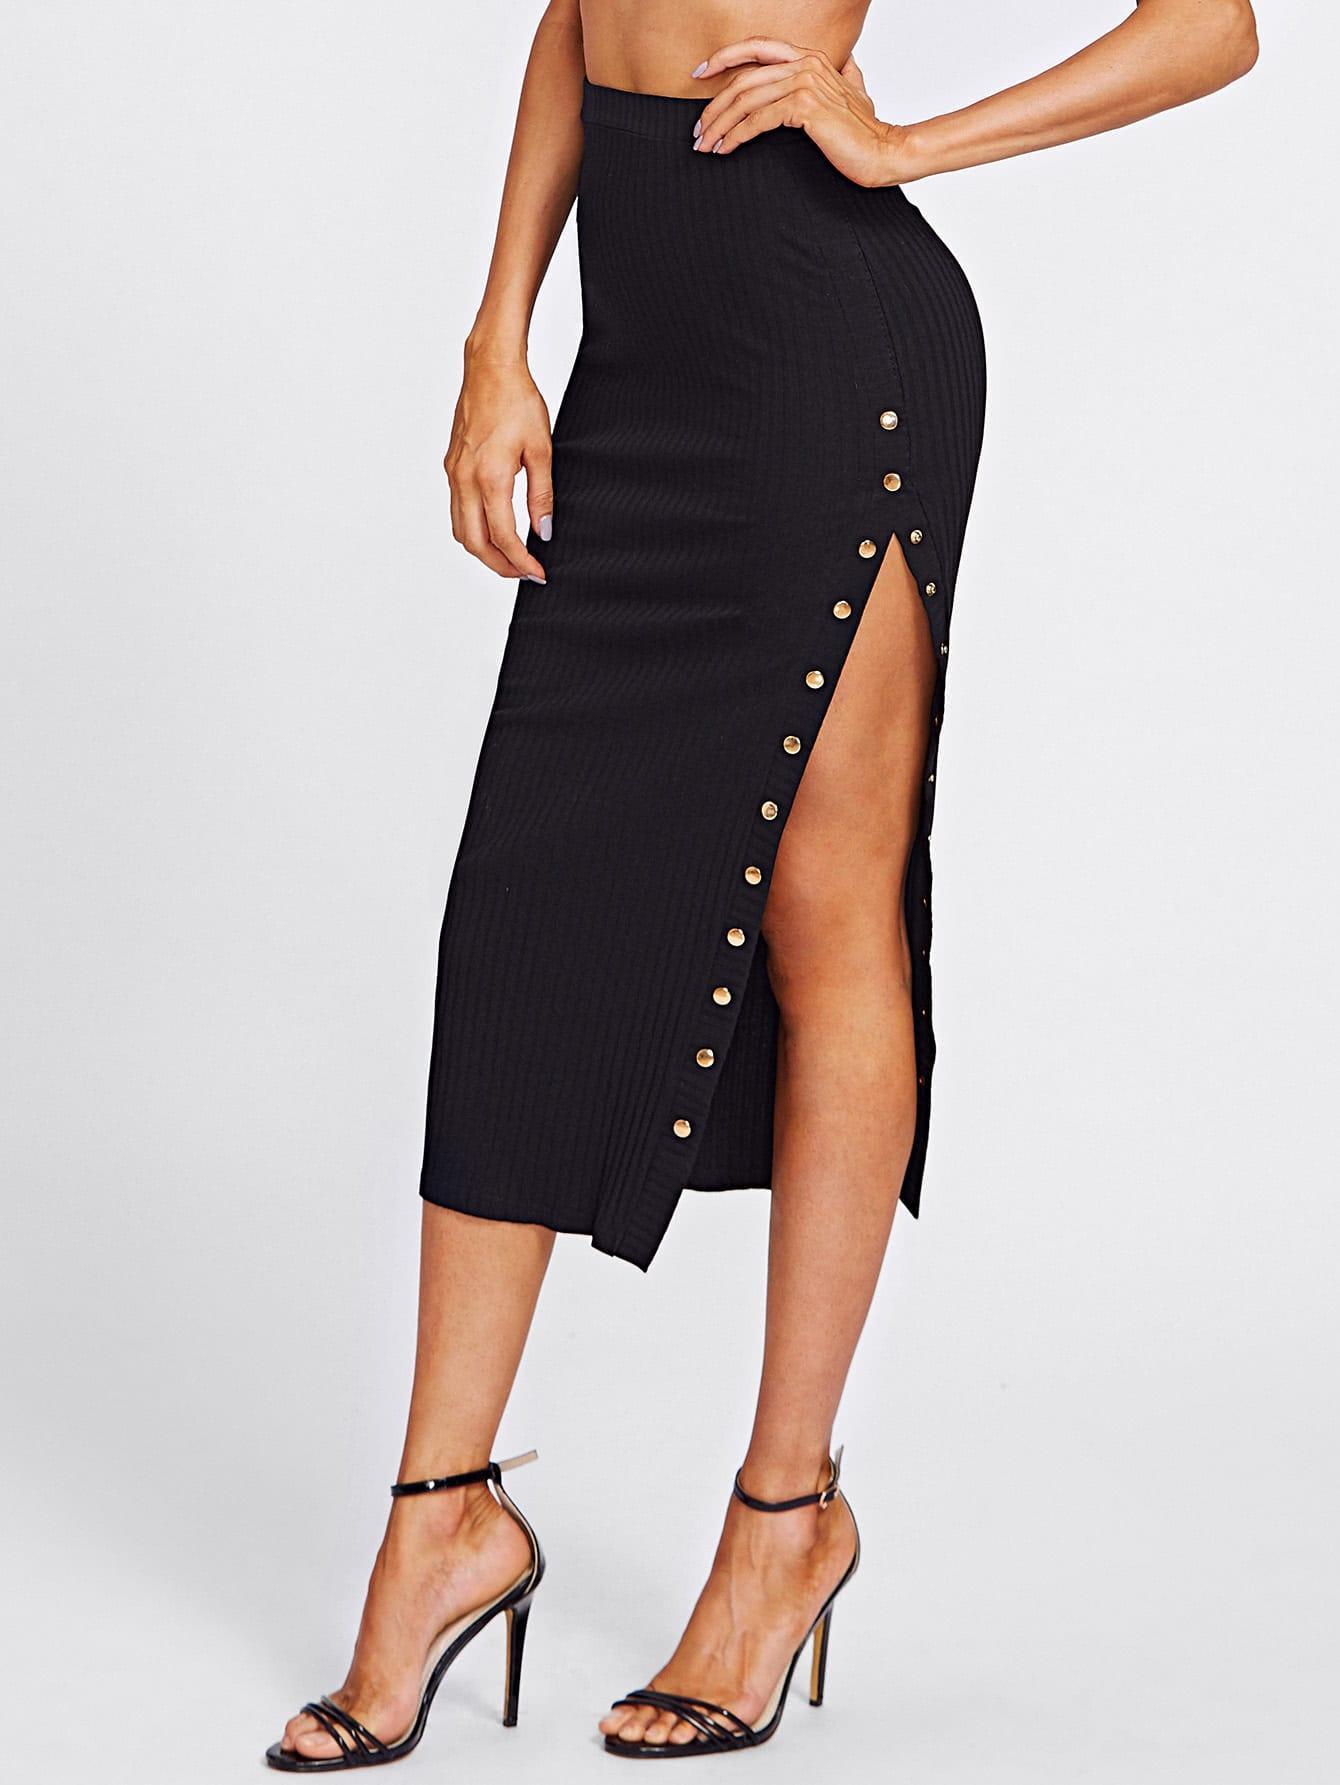 Studs High Slit Ribbed Skirt